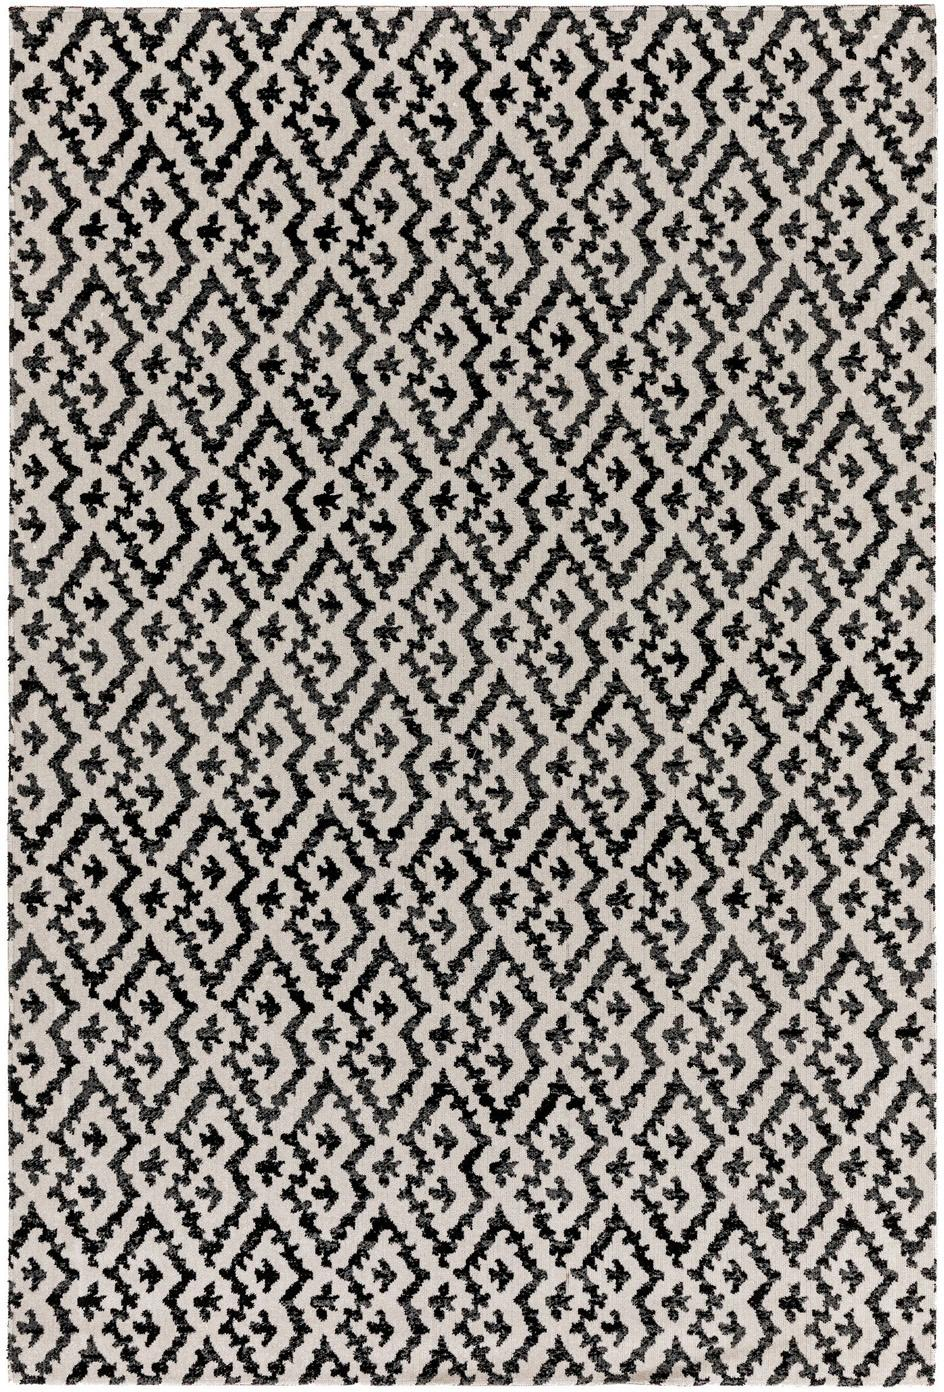 Tappeto etnico da interno-esterno Jerry, 100% polipropilene, Nero, bianco, Larg. 80 x Lung. 150 cm (taglia XS)